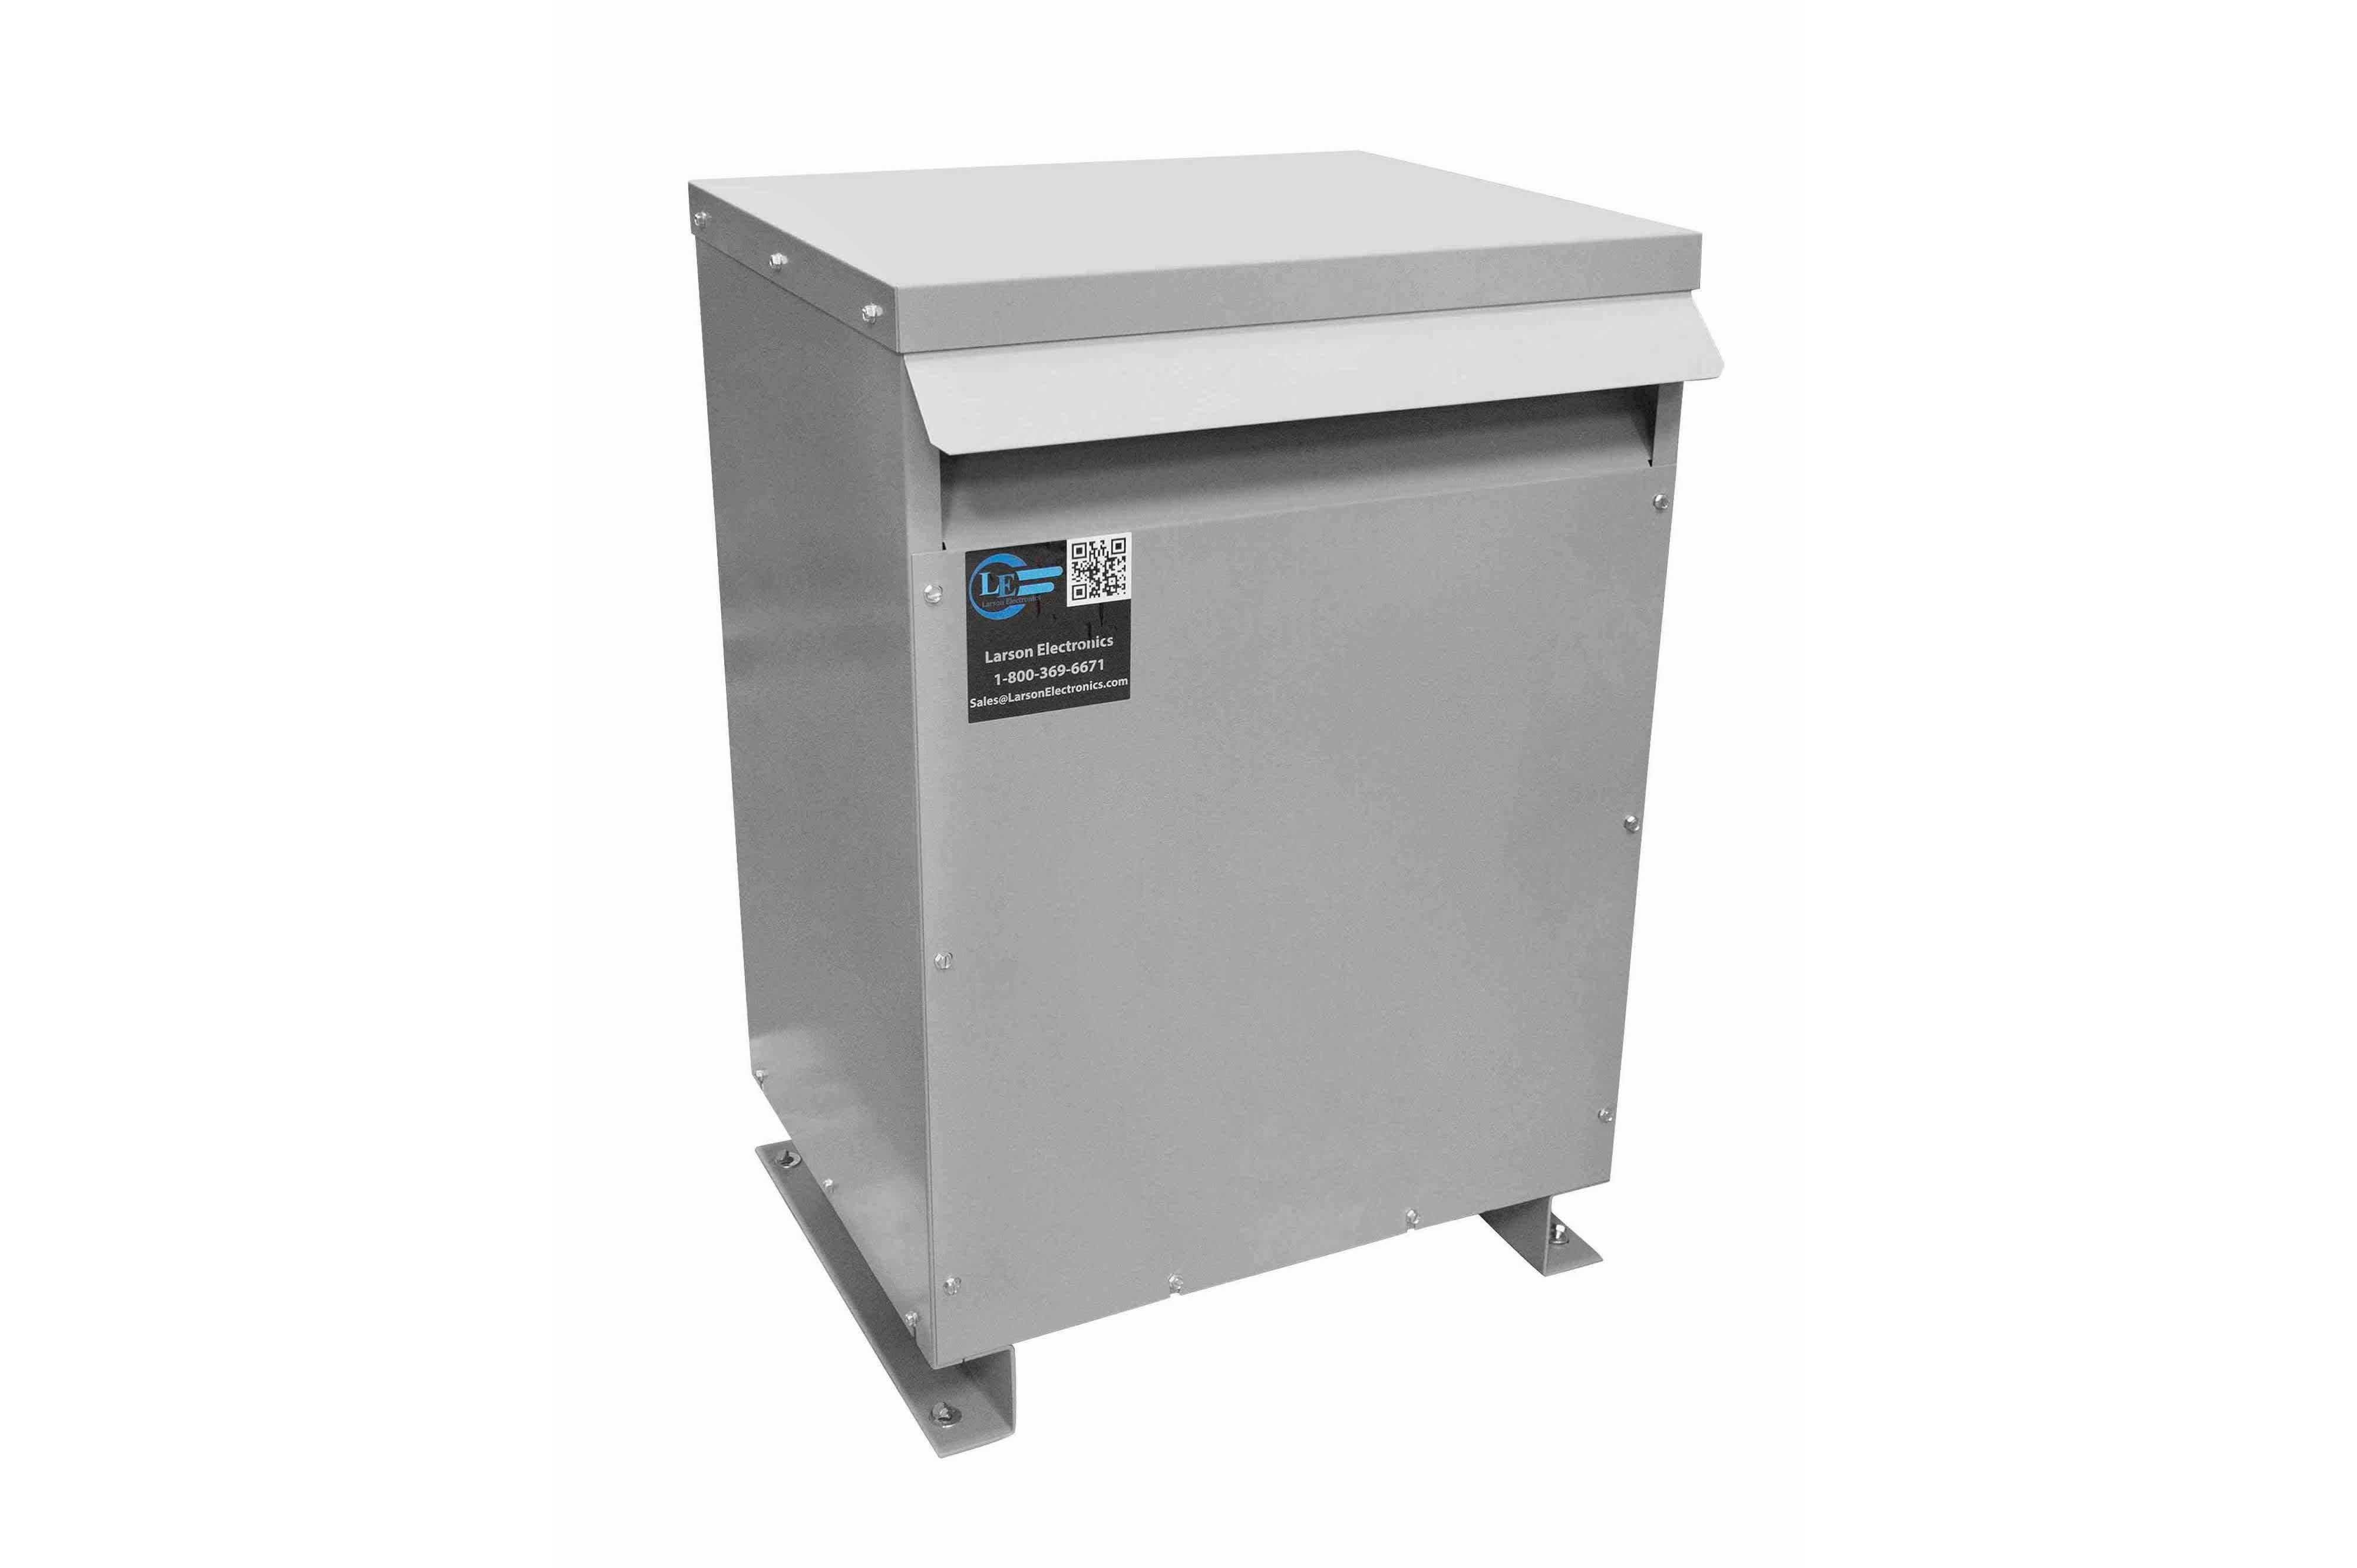 800 kVA 3PH Isolation Transformer, 208V Wye Primary, 240V Delta Secondary, N3R, Ventilated, 60 Hz